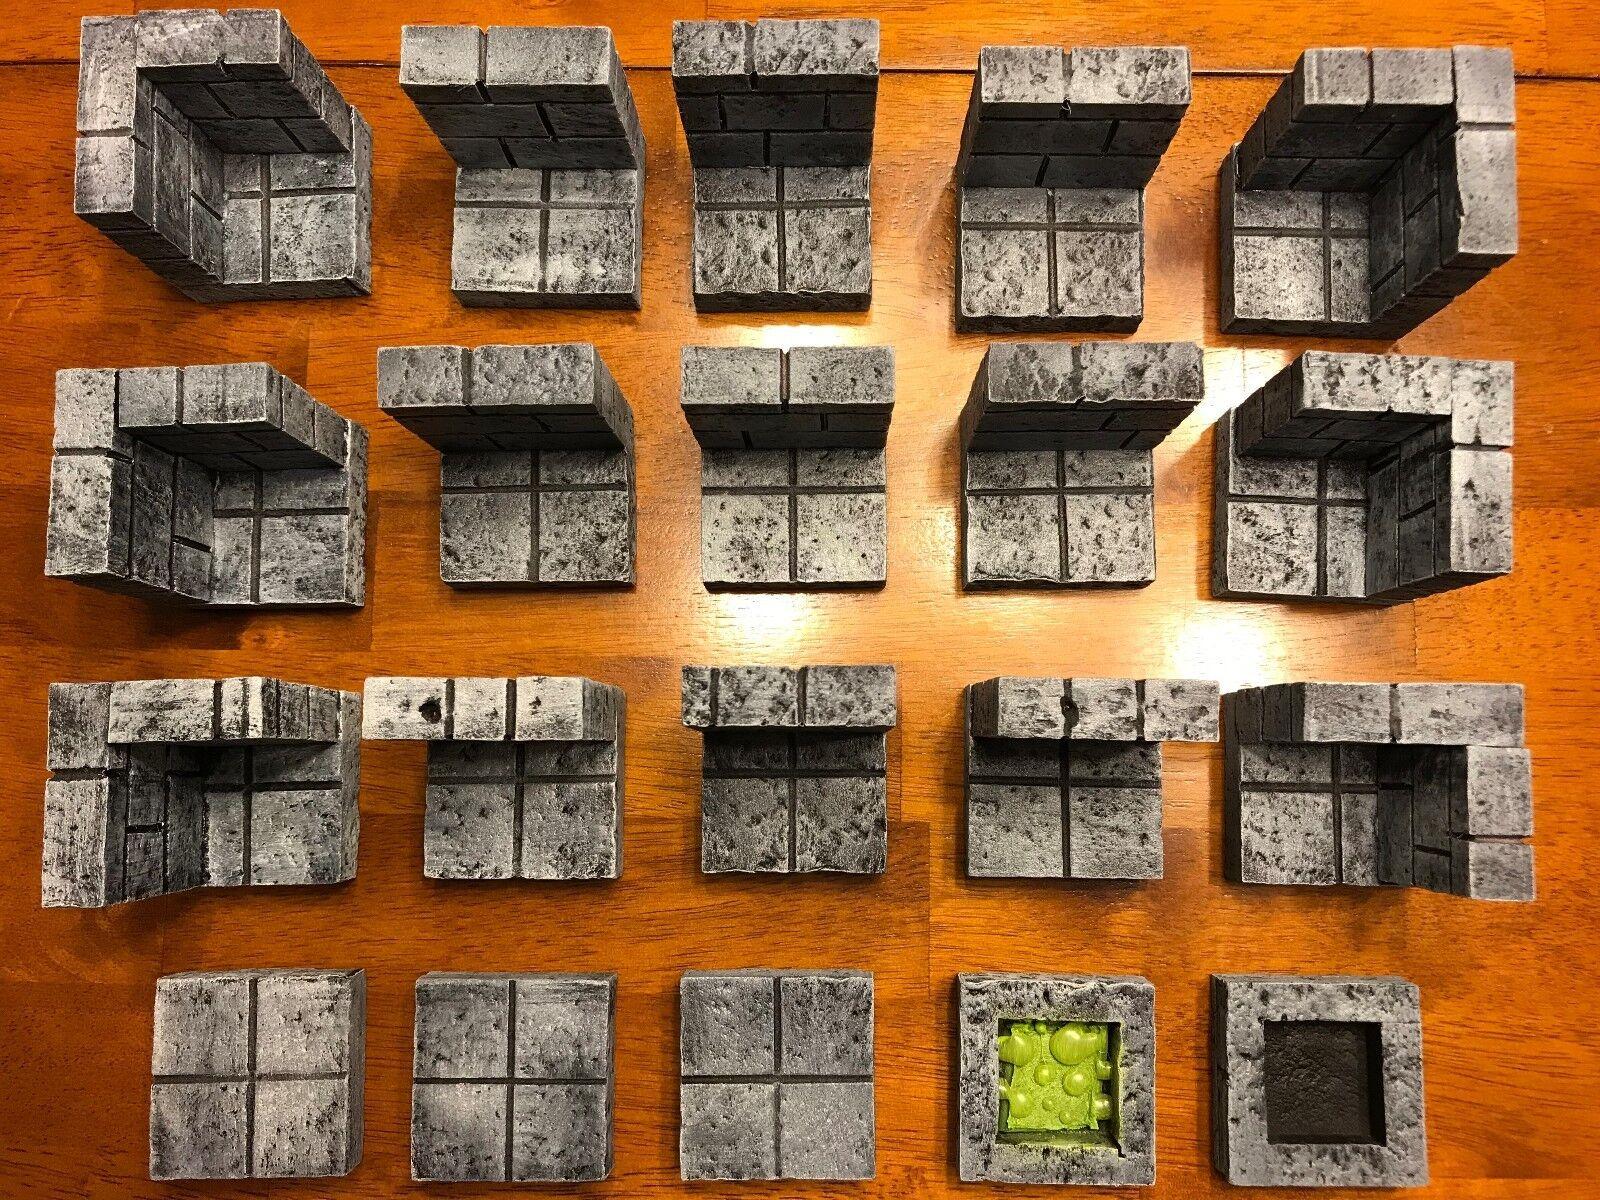 Dungeon Modular Set Wargame Scenery Terrain Dungeons & Dragons Pathfinder d&d